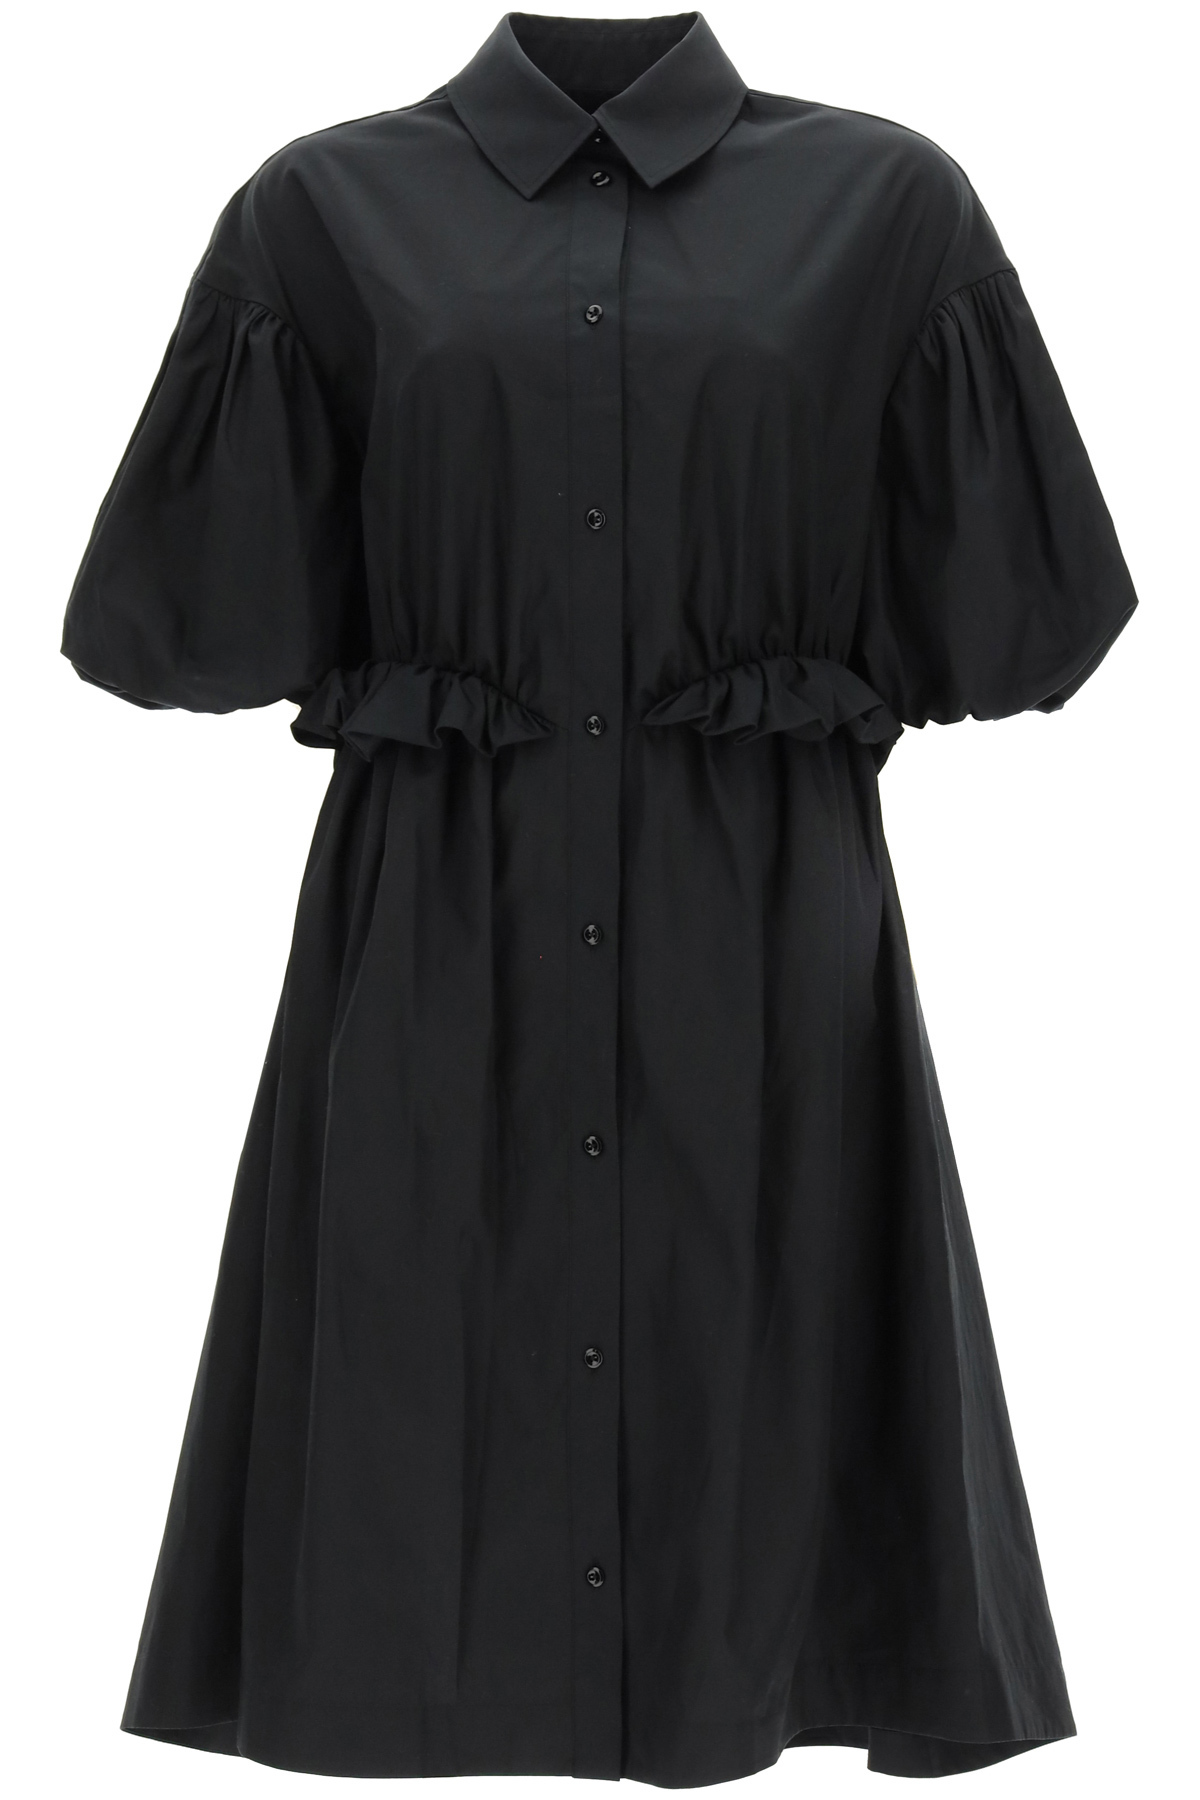 Simone rocha abito chemisier oversize